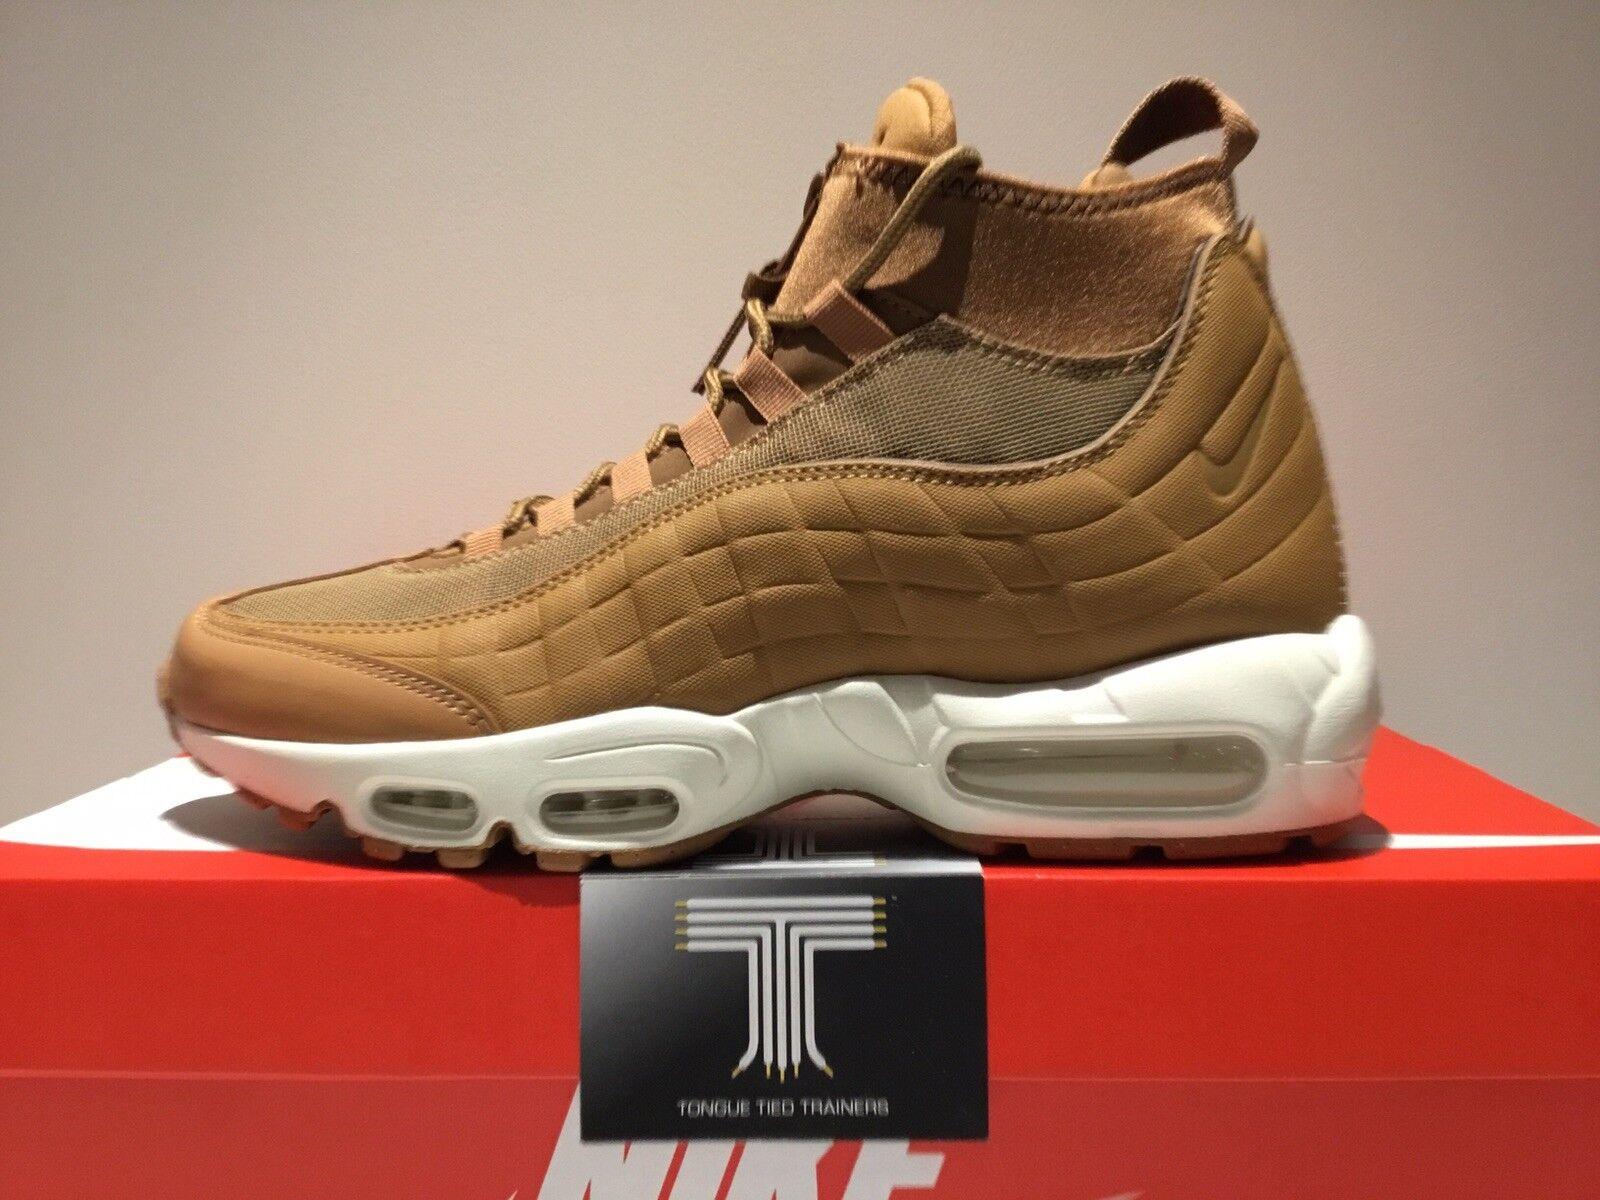 Nike Air Max 95 Sneakerboot  806809 201  Size 8